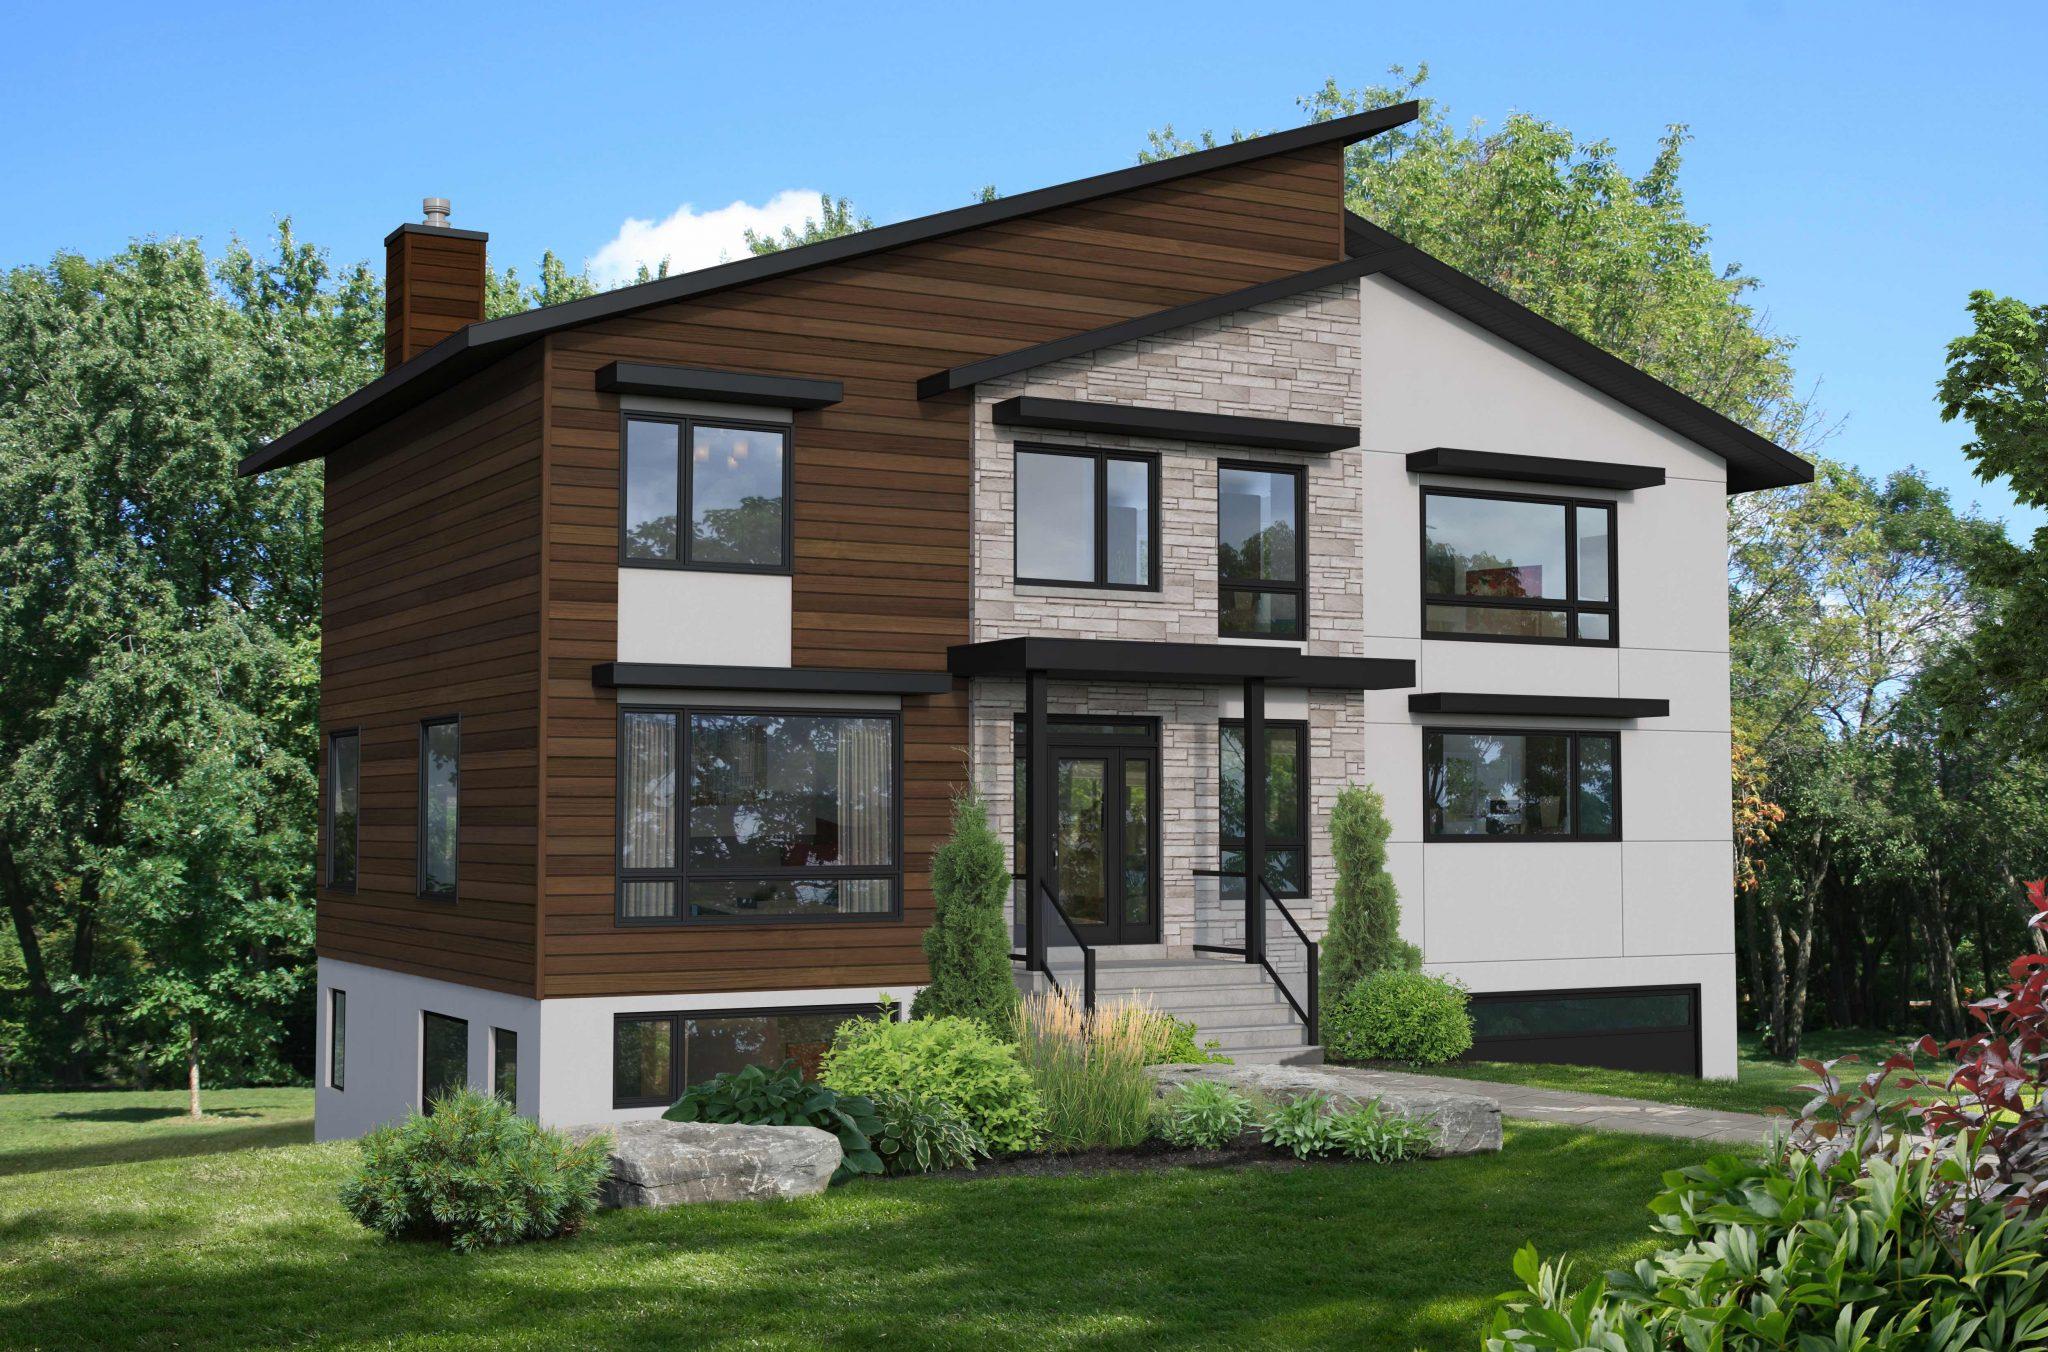 alba construction entrepreneur construction et r novation. Black Bedroom Furniture Sets. Home Design Ideas